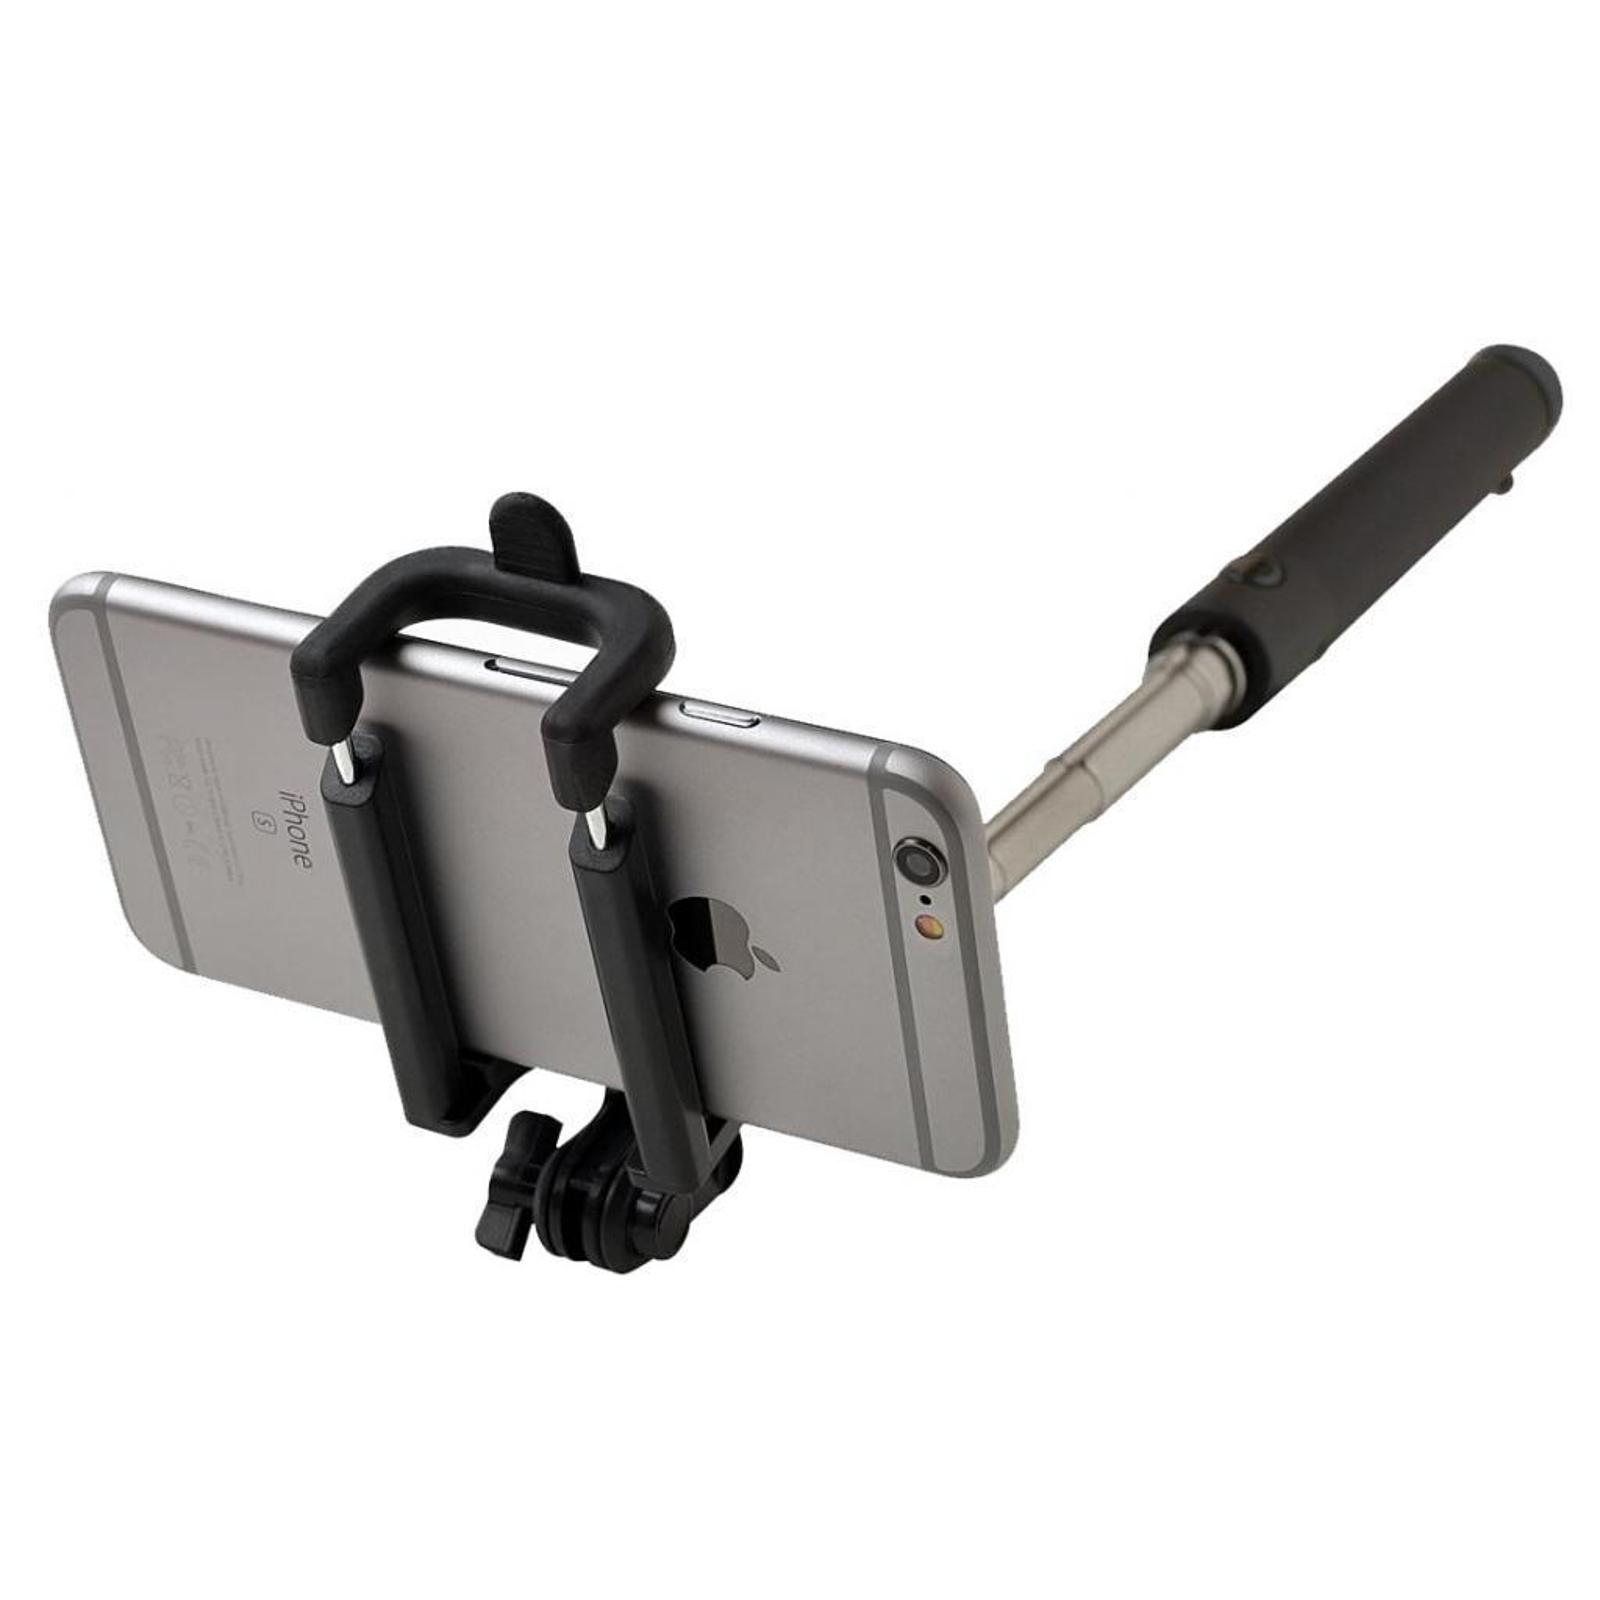 Монопод для селфи Grand-X Deluxe Bluetooth U-крепление (MPGDBUB) изображение 7